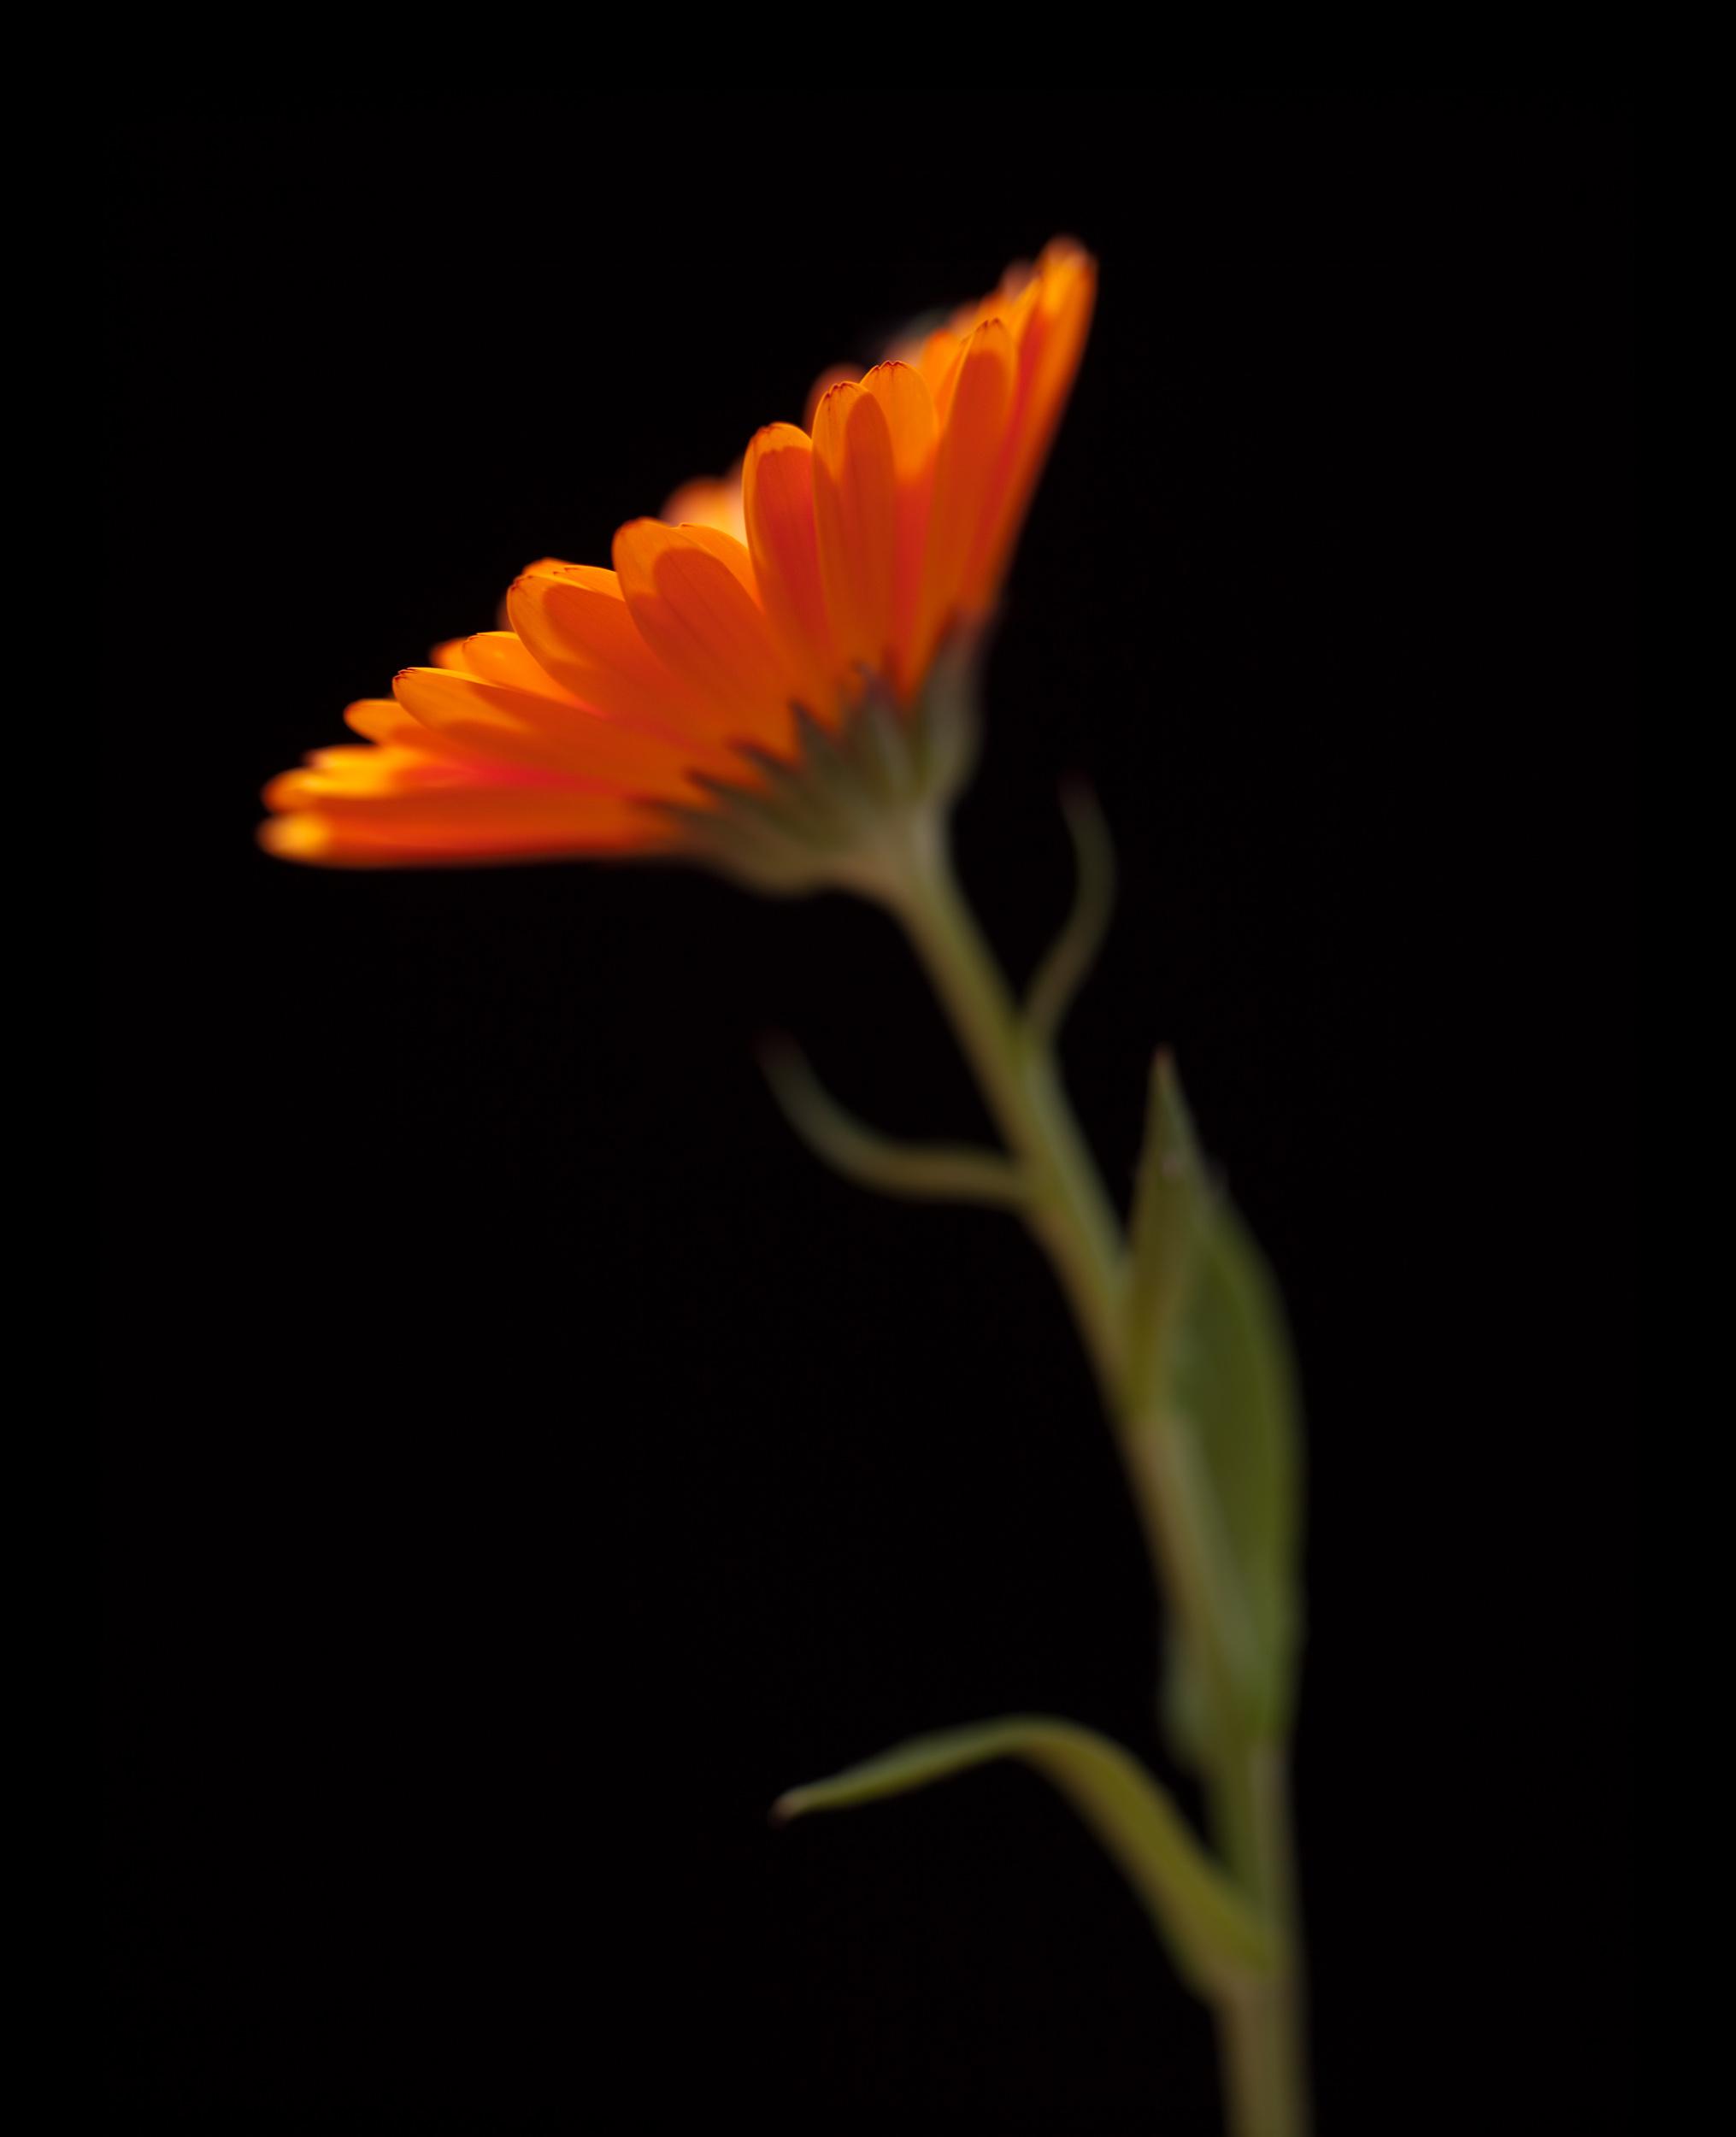 www.iaincrockart.com_flowers-006385.jpg